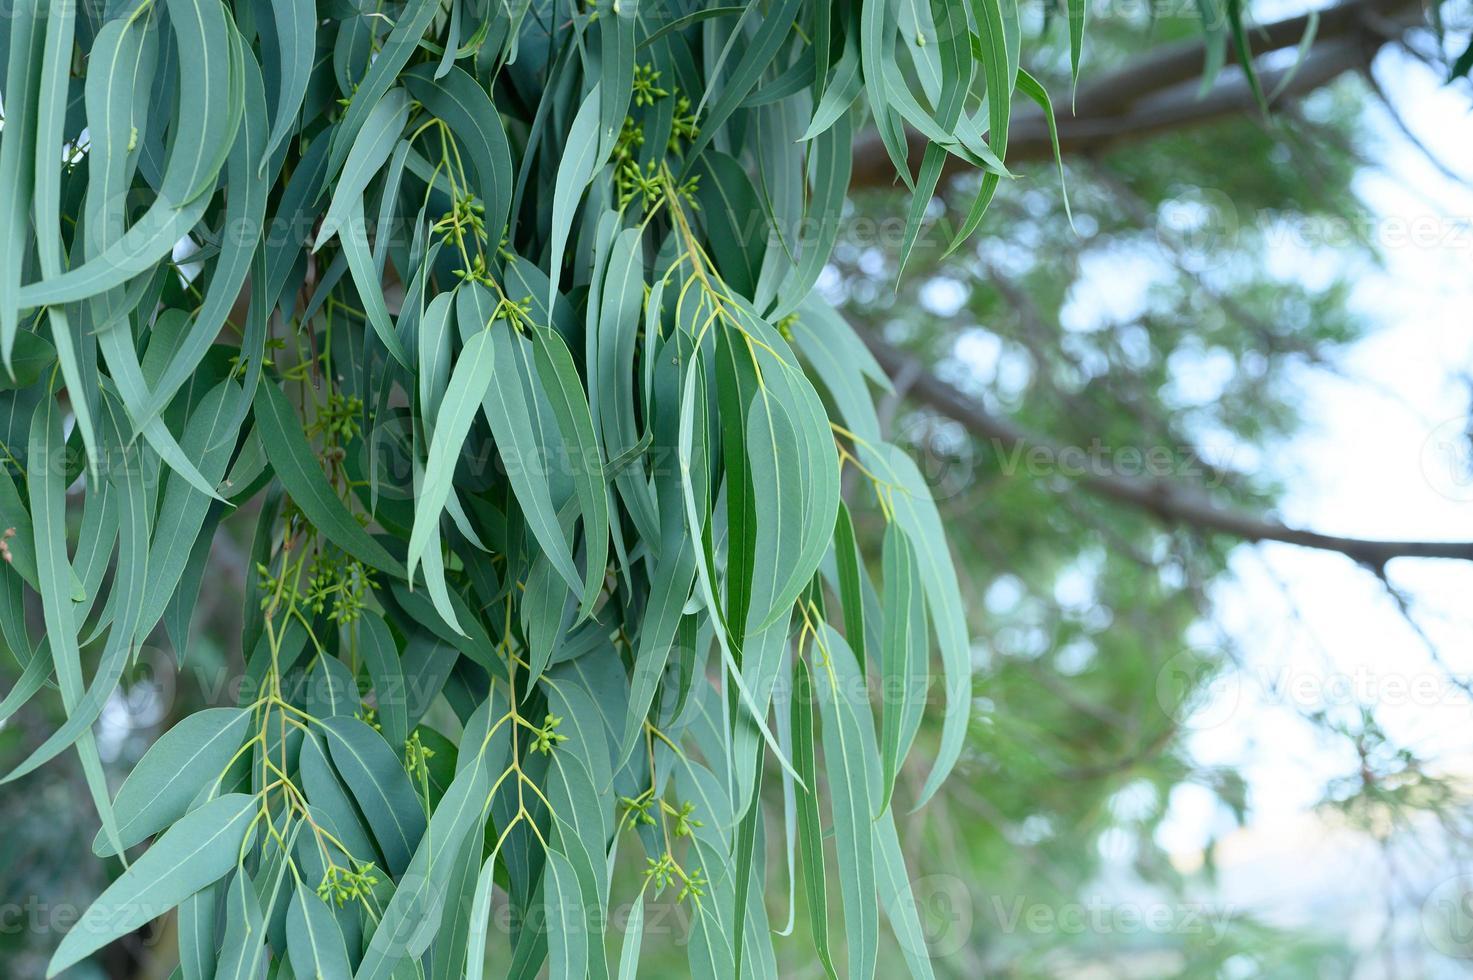 árbol de eucalipto en la naturaleza de fondo al aire libre foto